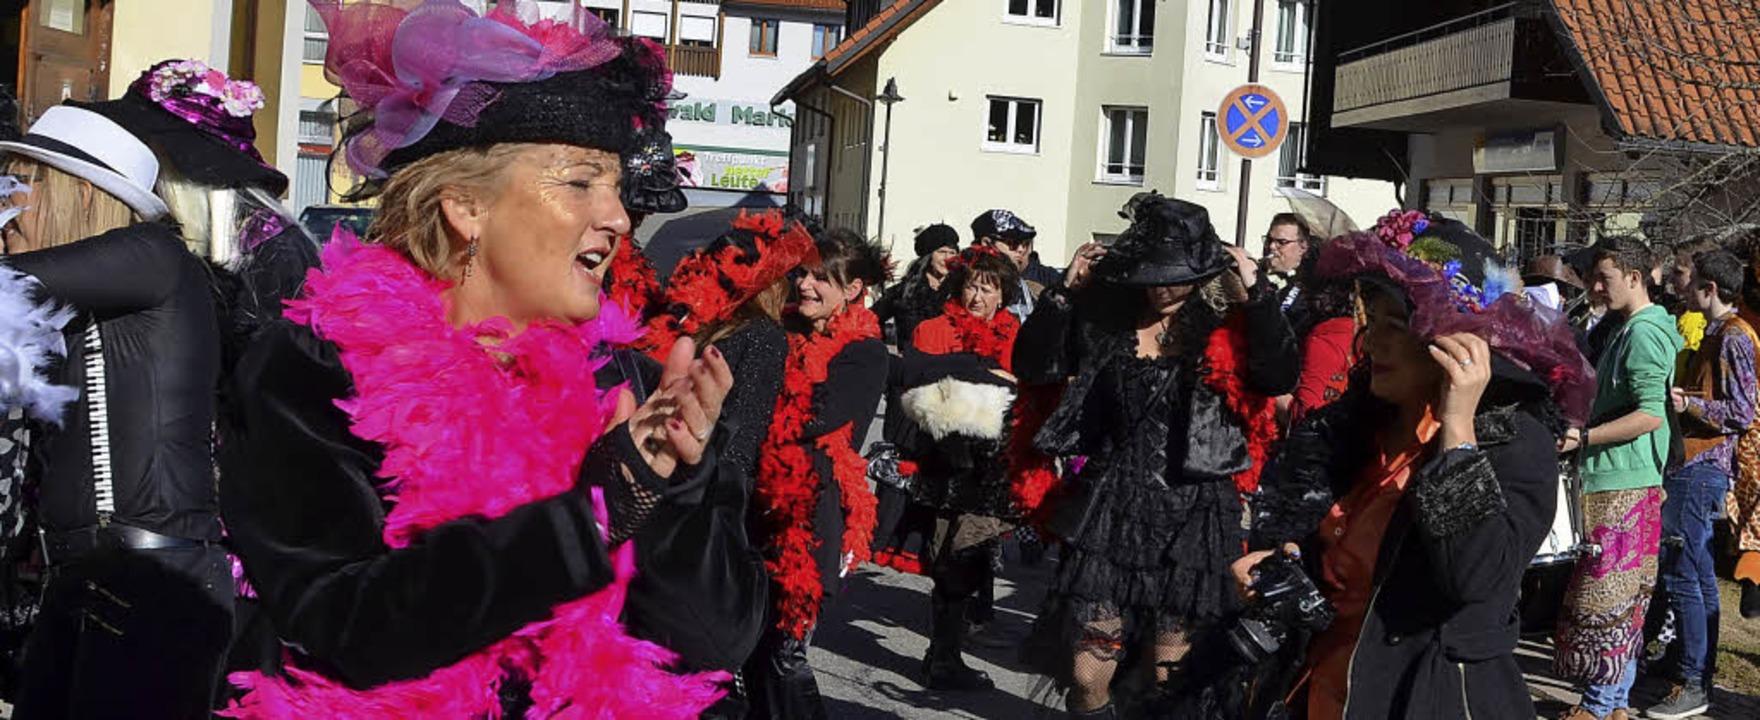 Wiiberfasnacht in Rickenbach  | Foto: CHRISTIANE SAHLI